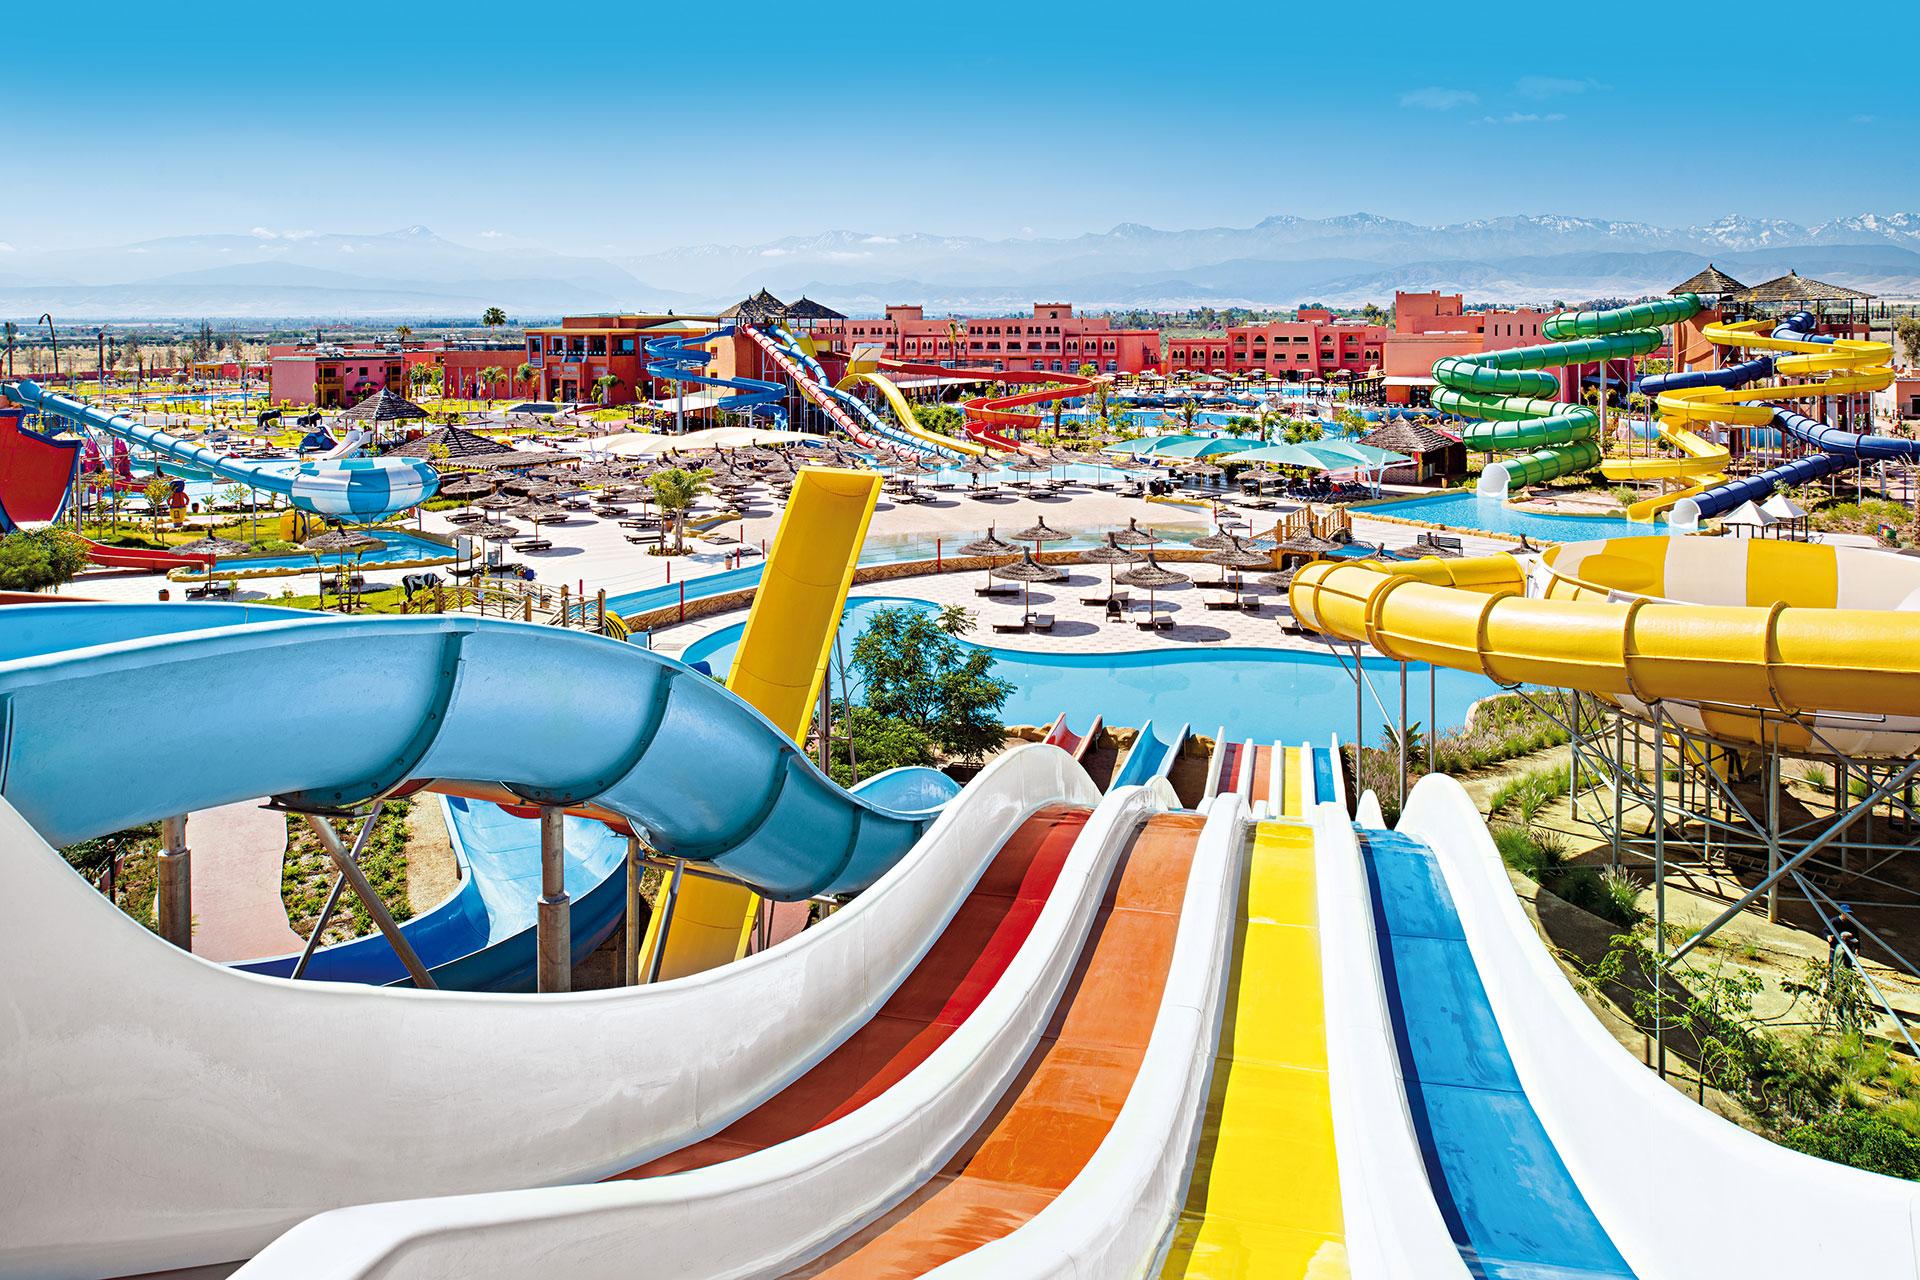 Labranda Aqua Fun Club